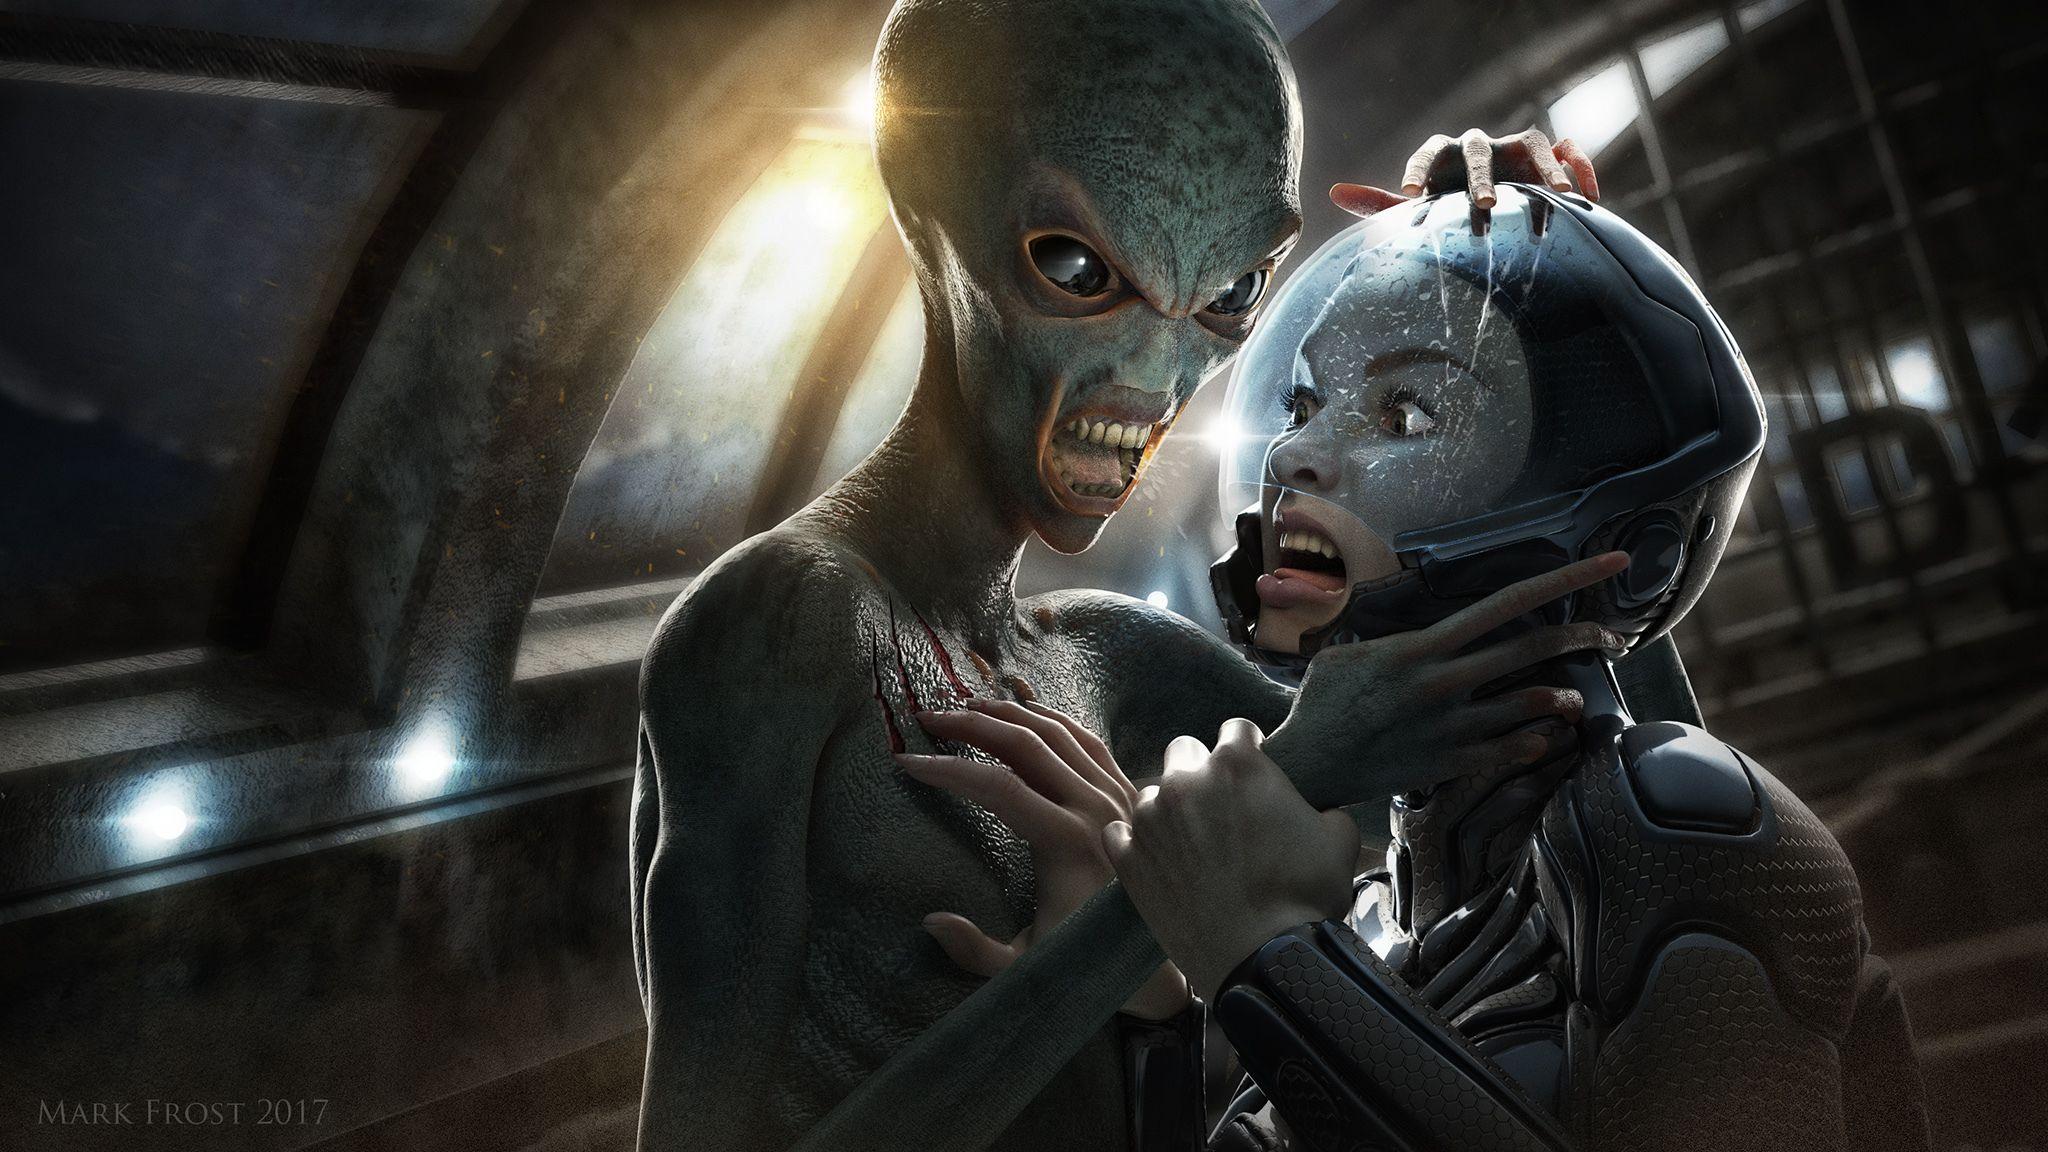 Un tipo diferente de extraterrestres Grises (VÍDEO)